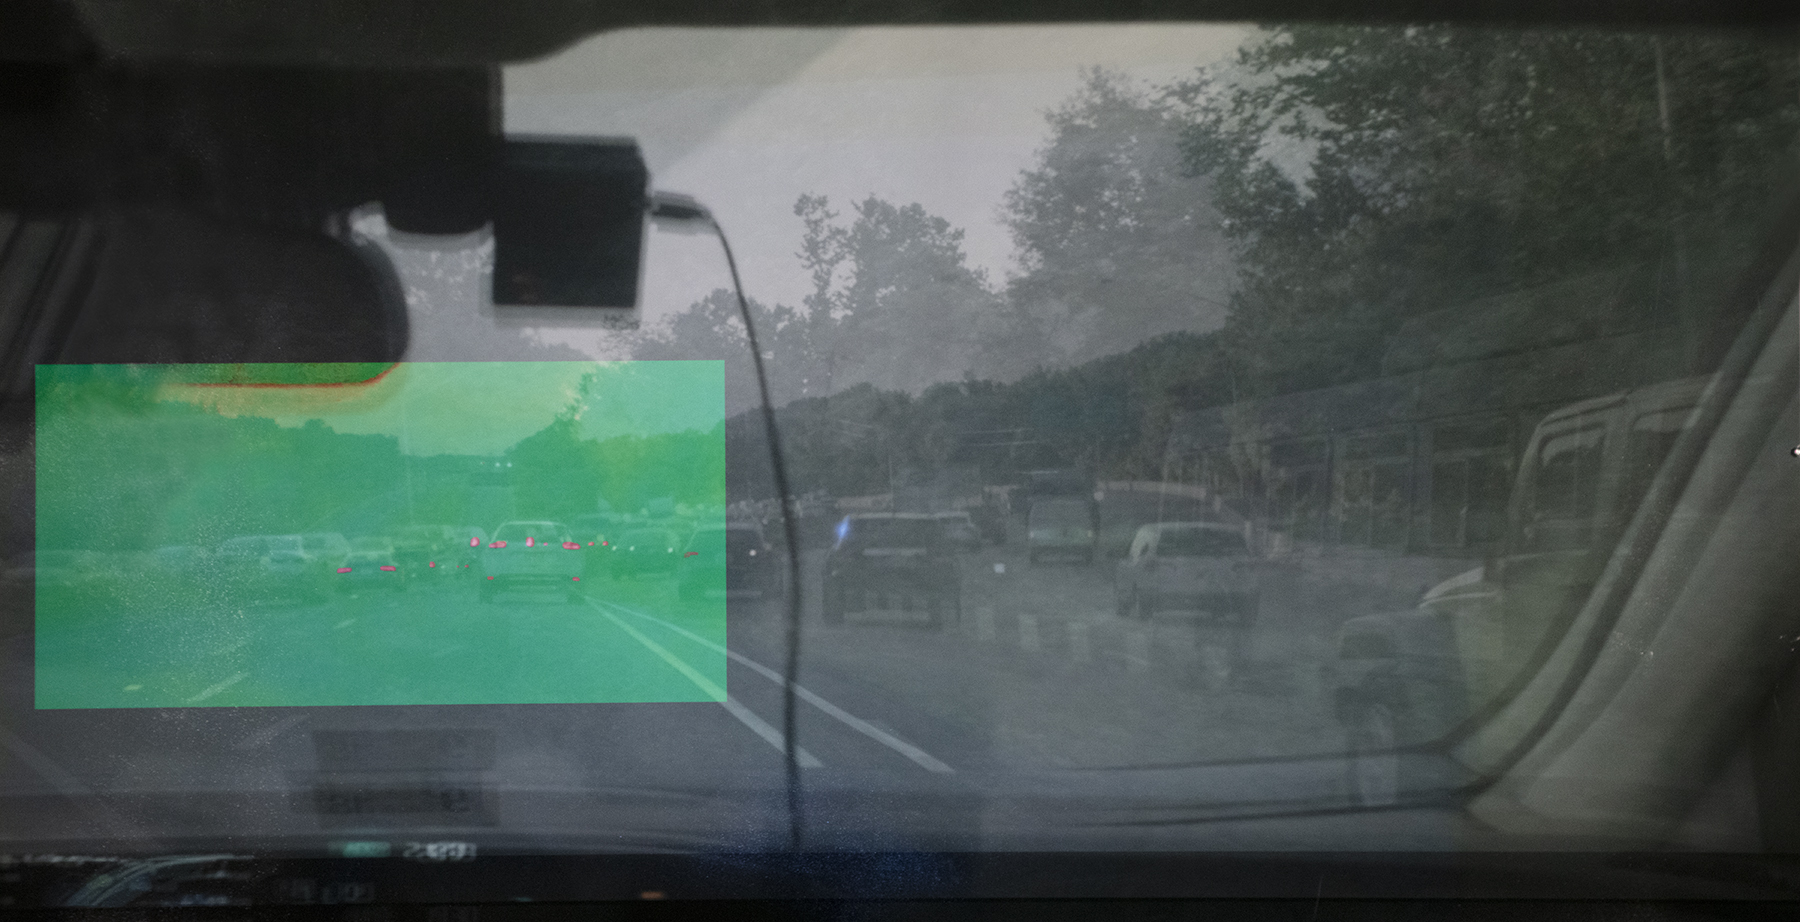 Memory Drive 1 - Video Projection on Archival InkJet Print